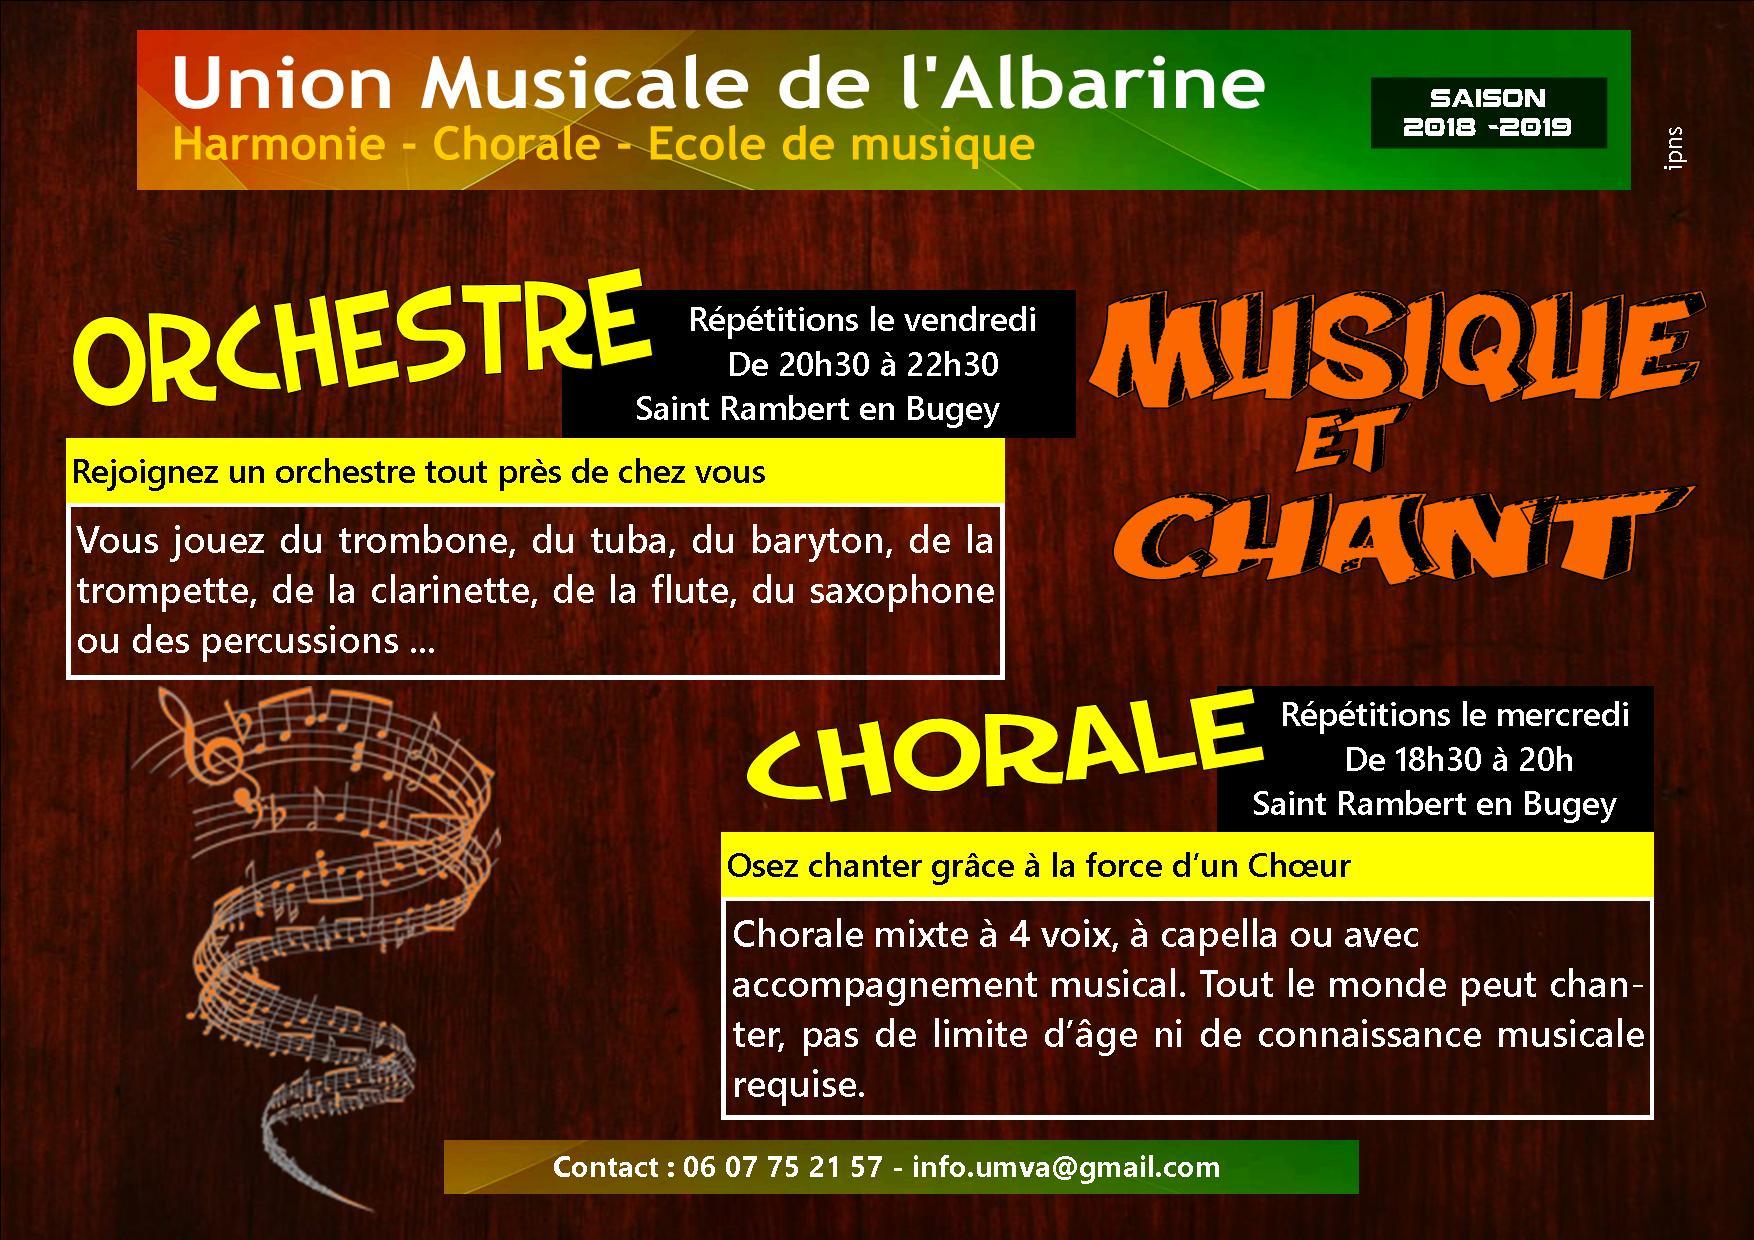 Harmonie et chorale 2018 2019